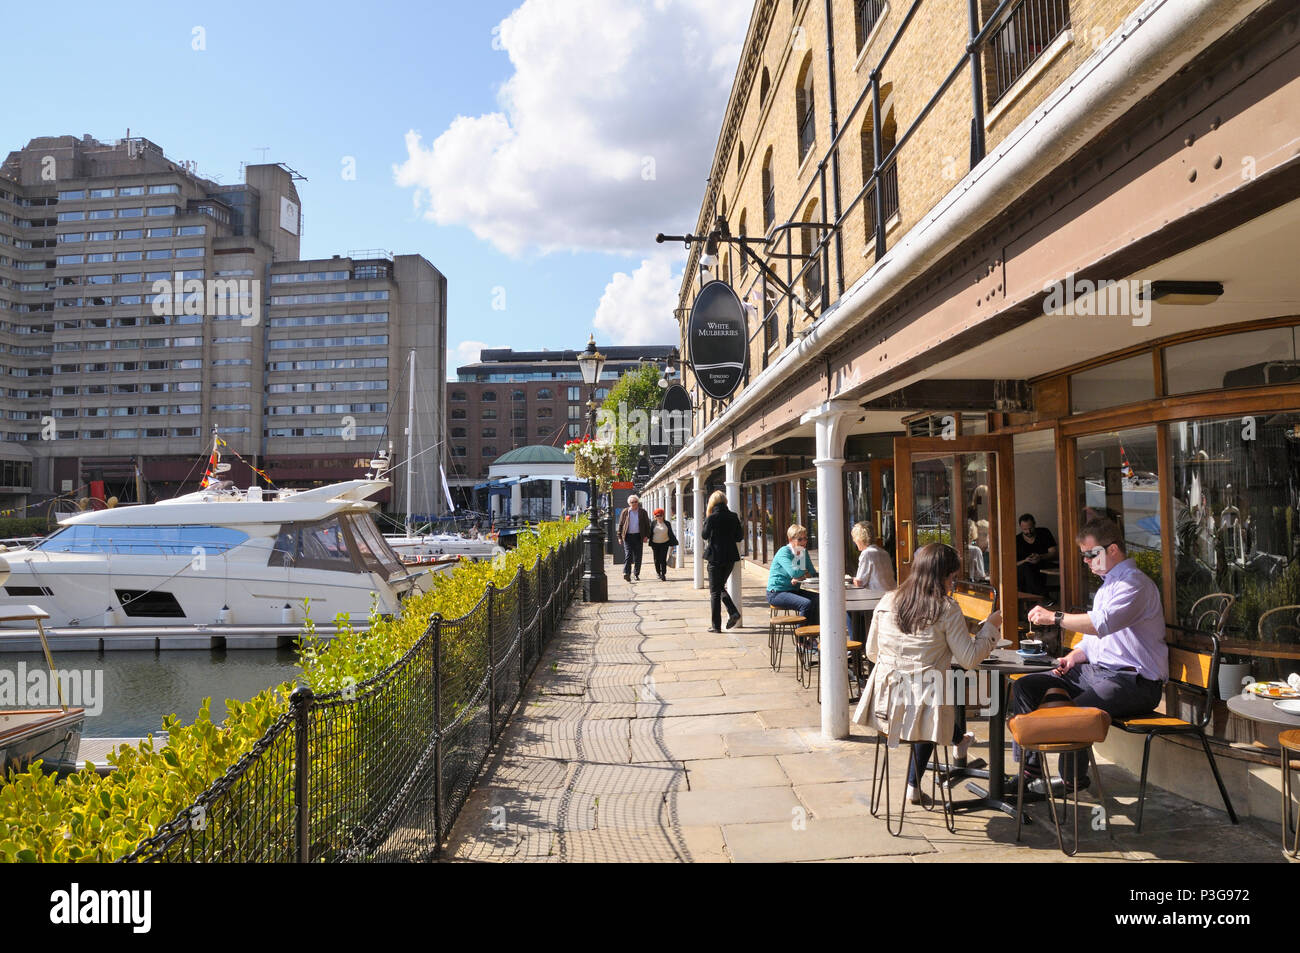 Cafés and restaurants along the marina at St Katharine Docks, Tower Hamlets, London, England, UK - Stock Image